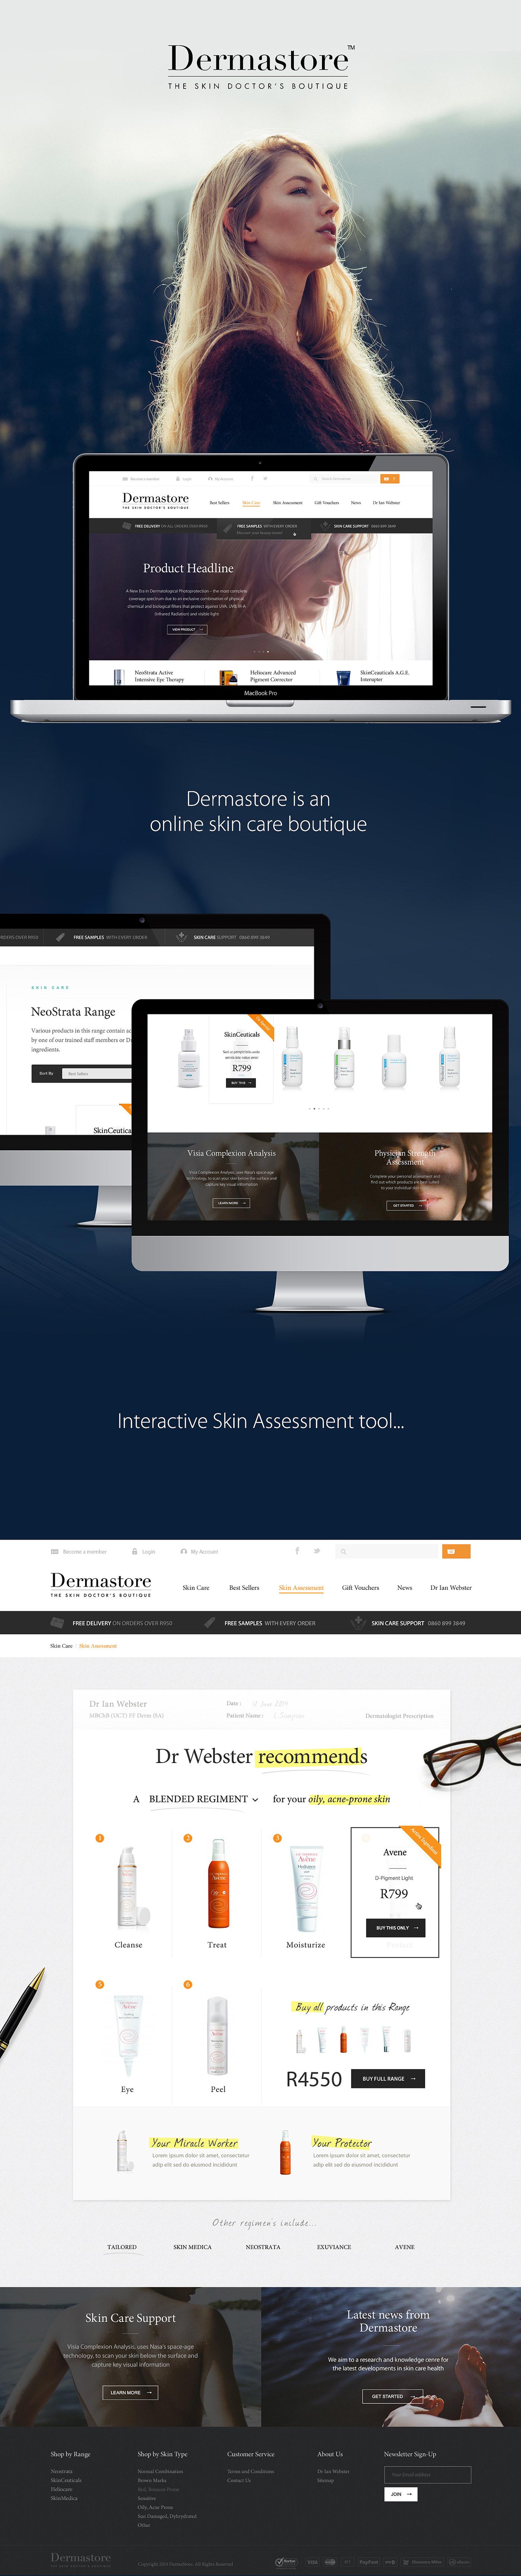 skincare skin products Dermastore doctor